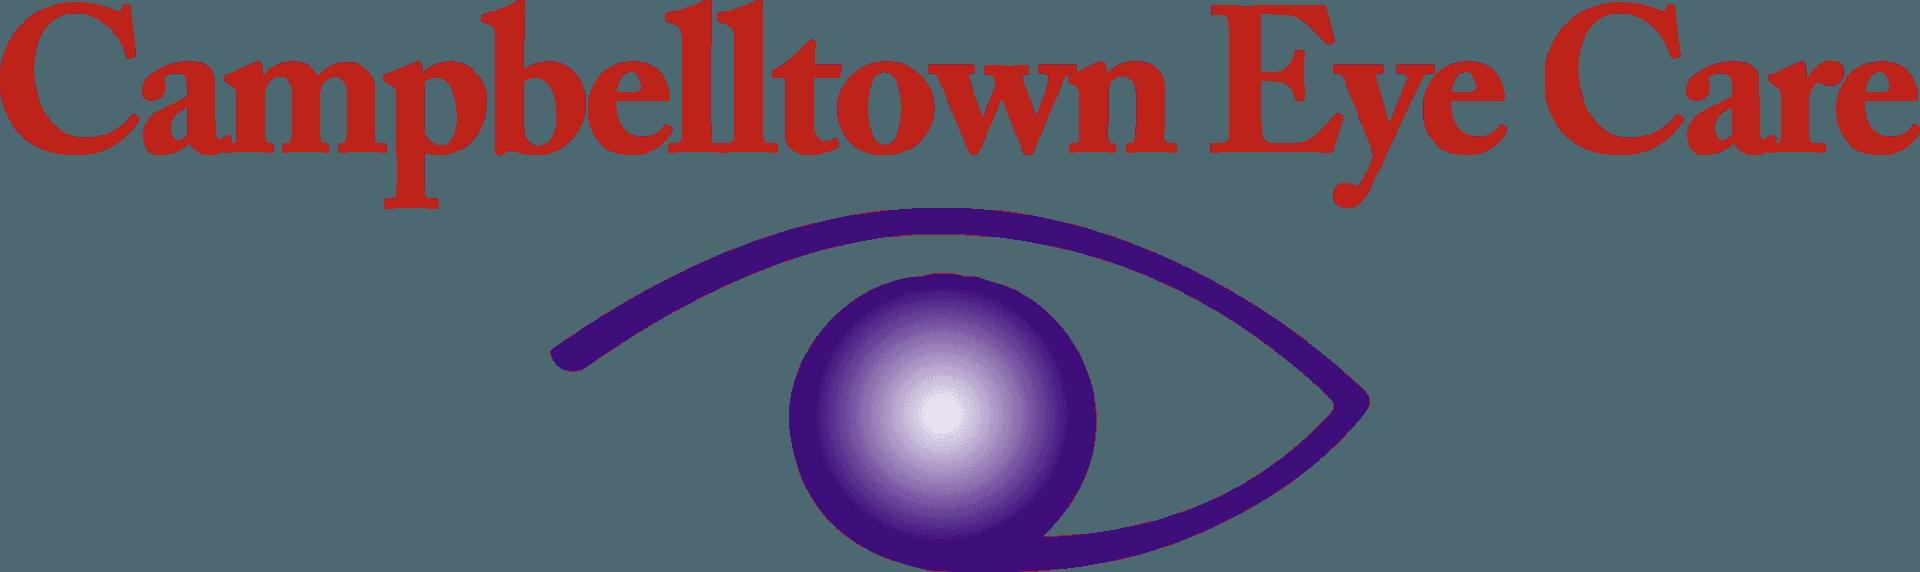 campbelltown eye care